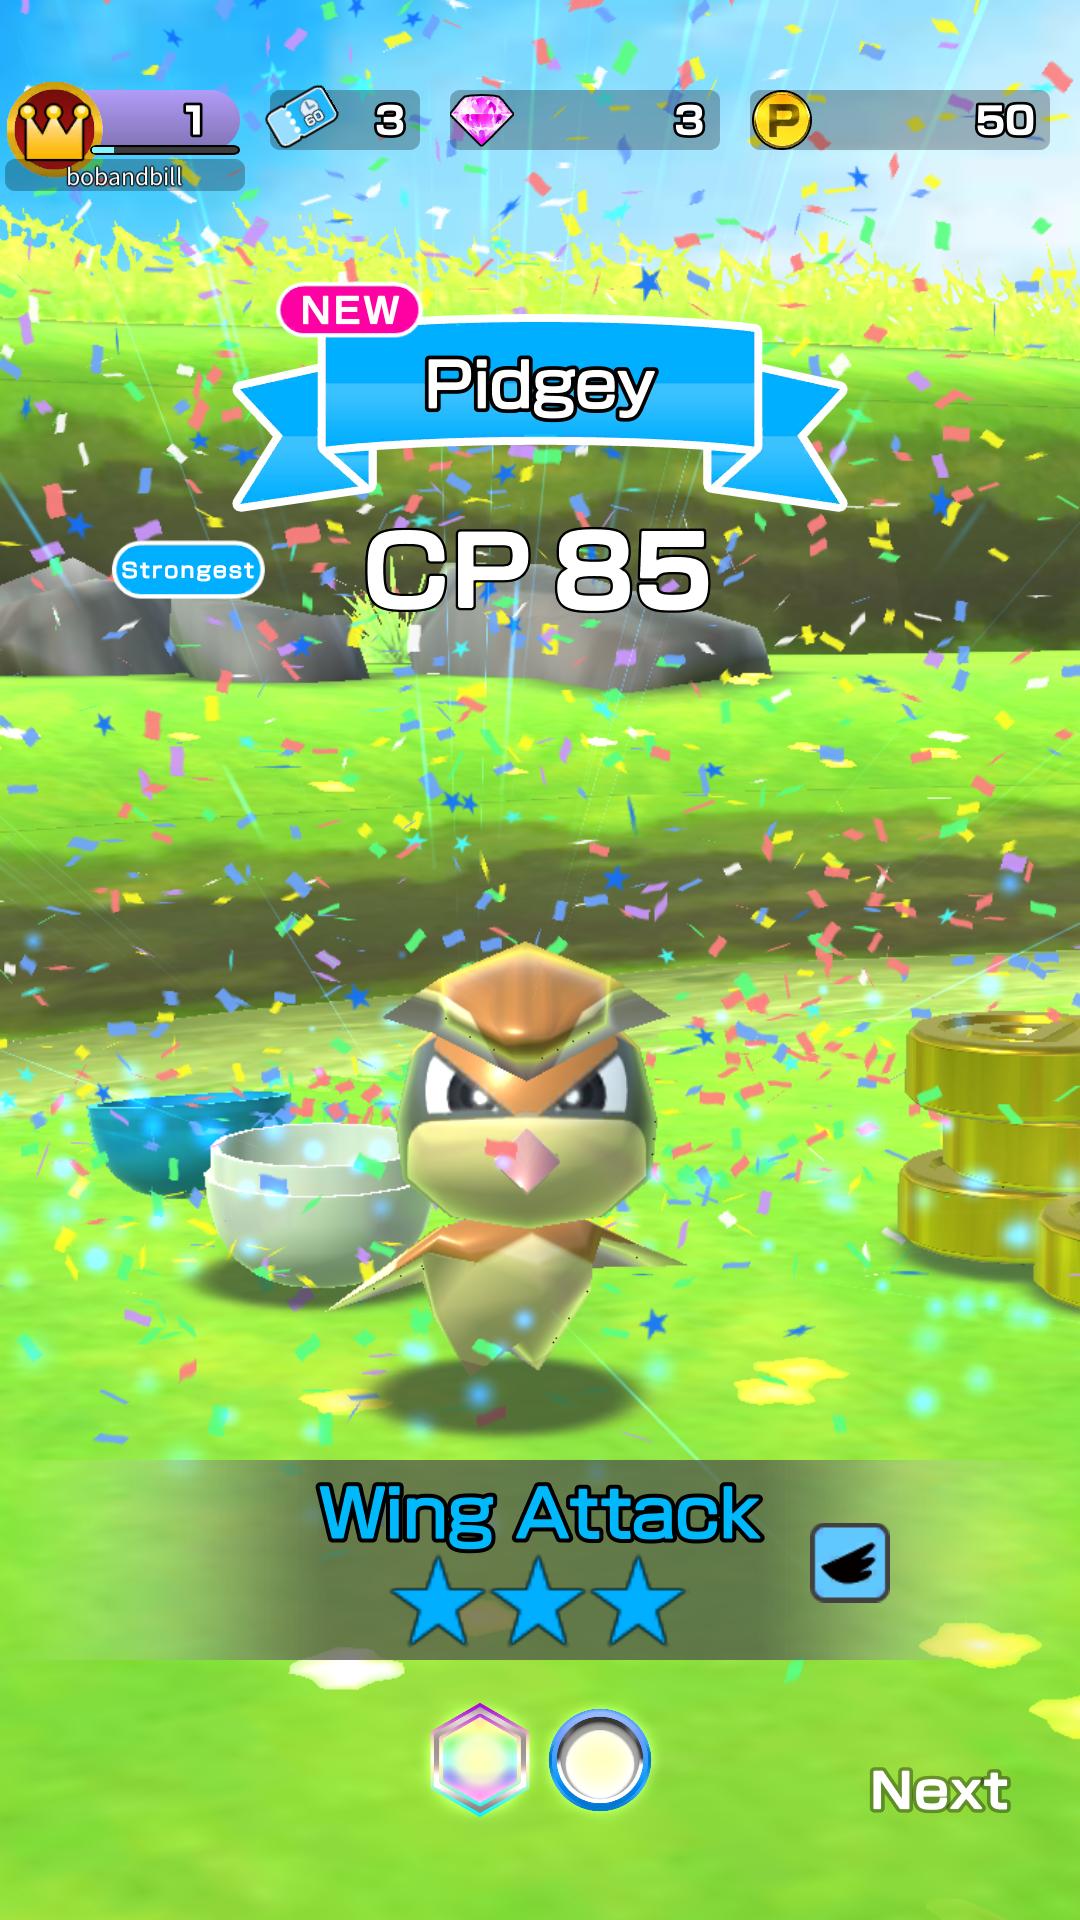 Guide to progressing in Pokémon Rumble Rush | PokéCommunity